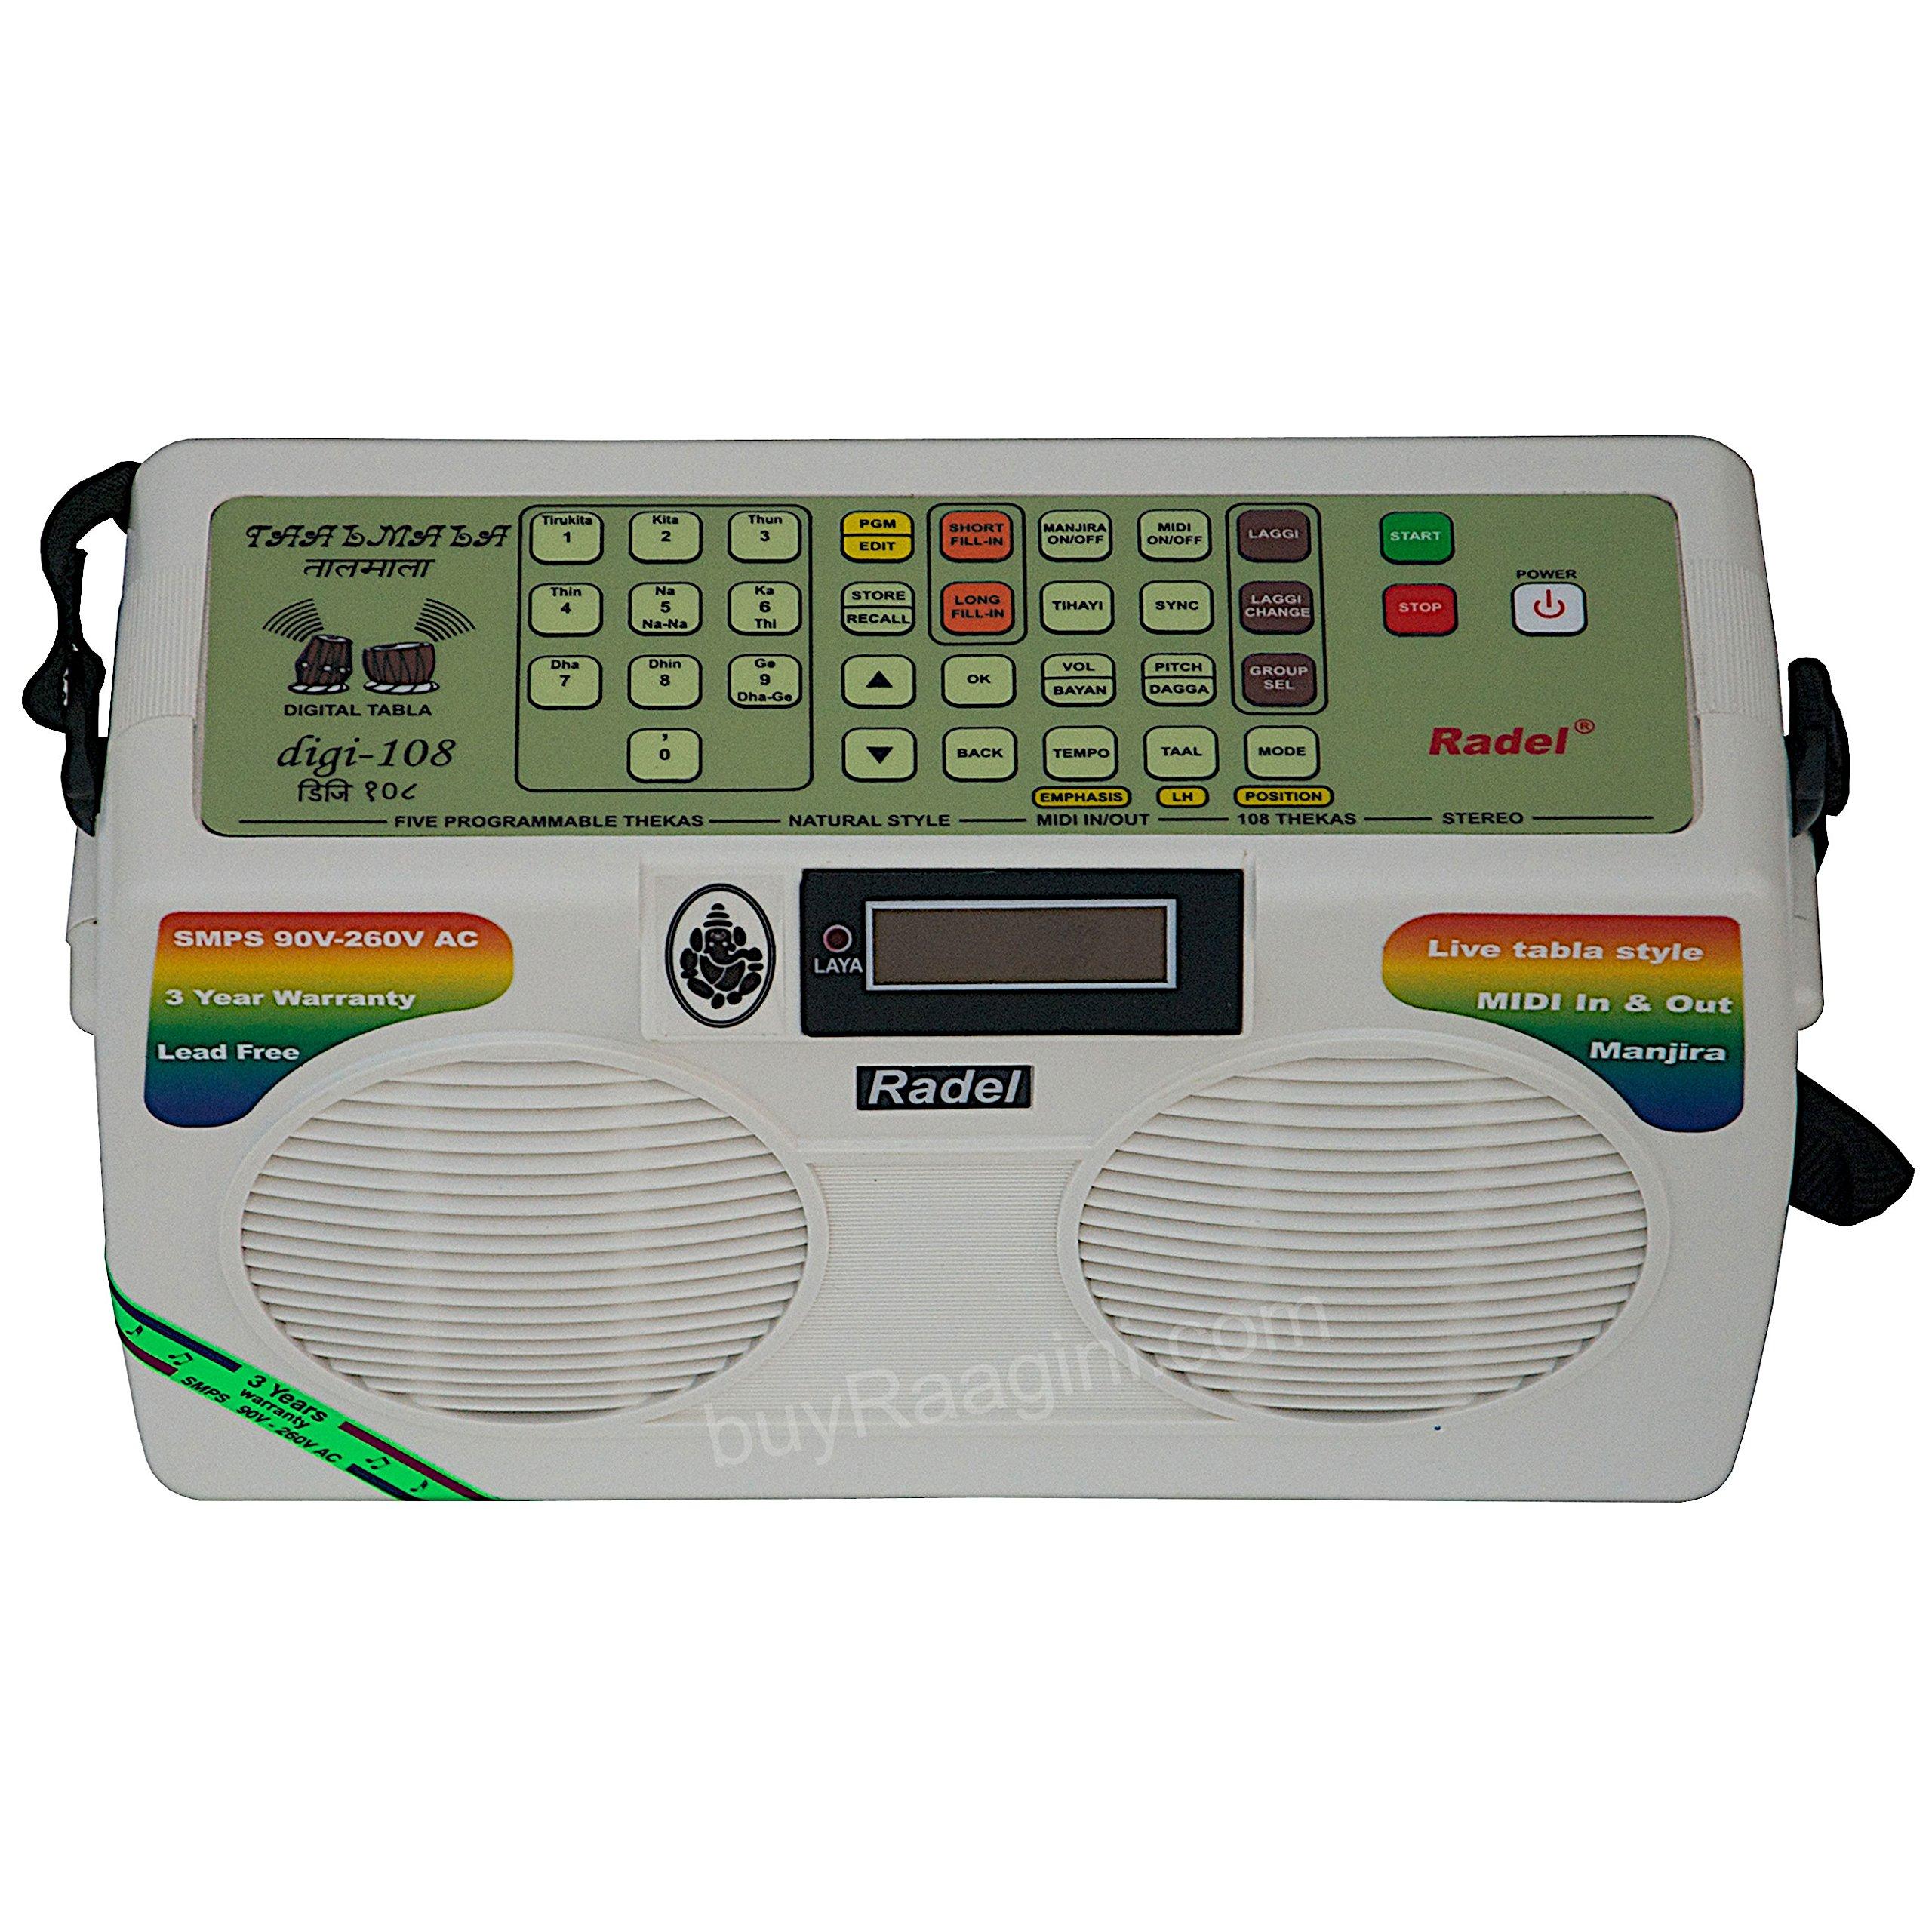 Electronic Tabla - RADEL Taalmala - Digi 108, Electronic Tabla & Manjira - Tabla Sampler, DJ Tabla Sound Machine, Instruction Manual, Power Cord, Bag (US-PDI-AAF) by Radel at buyRaagini.com (Image #3)